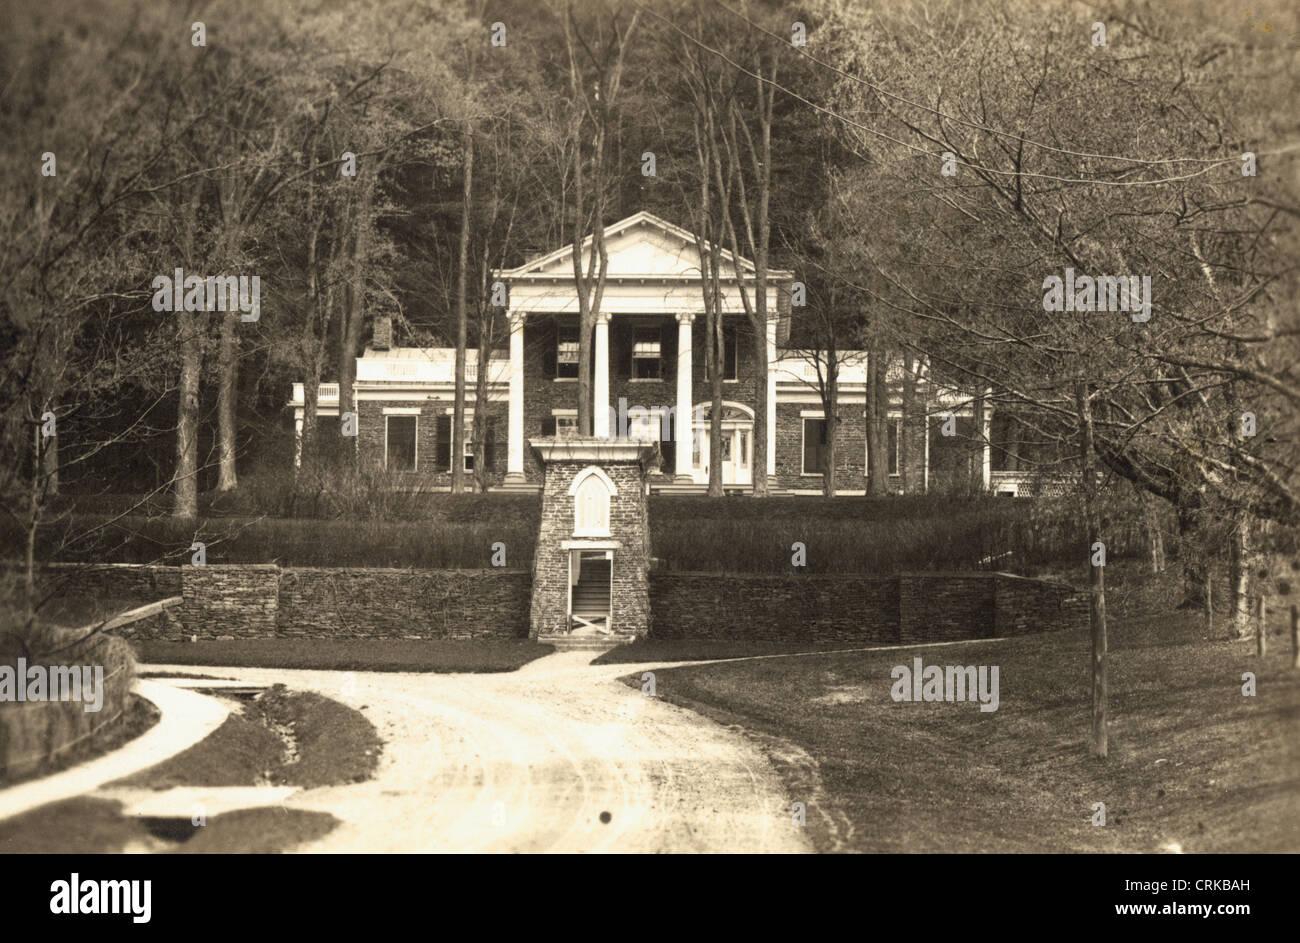 Nineteenth Century Fieldstone Greek Revival Mansion - Stock Image